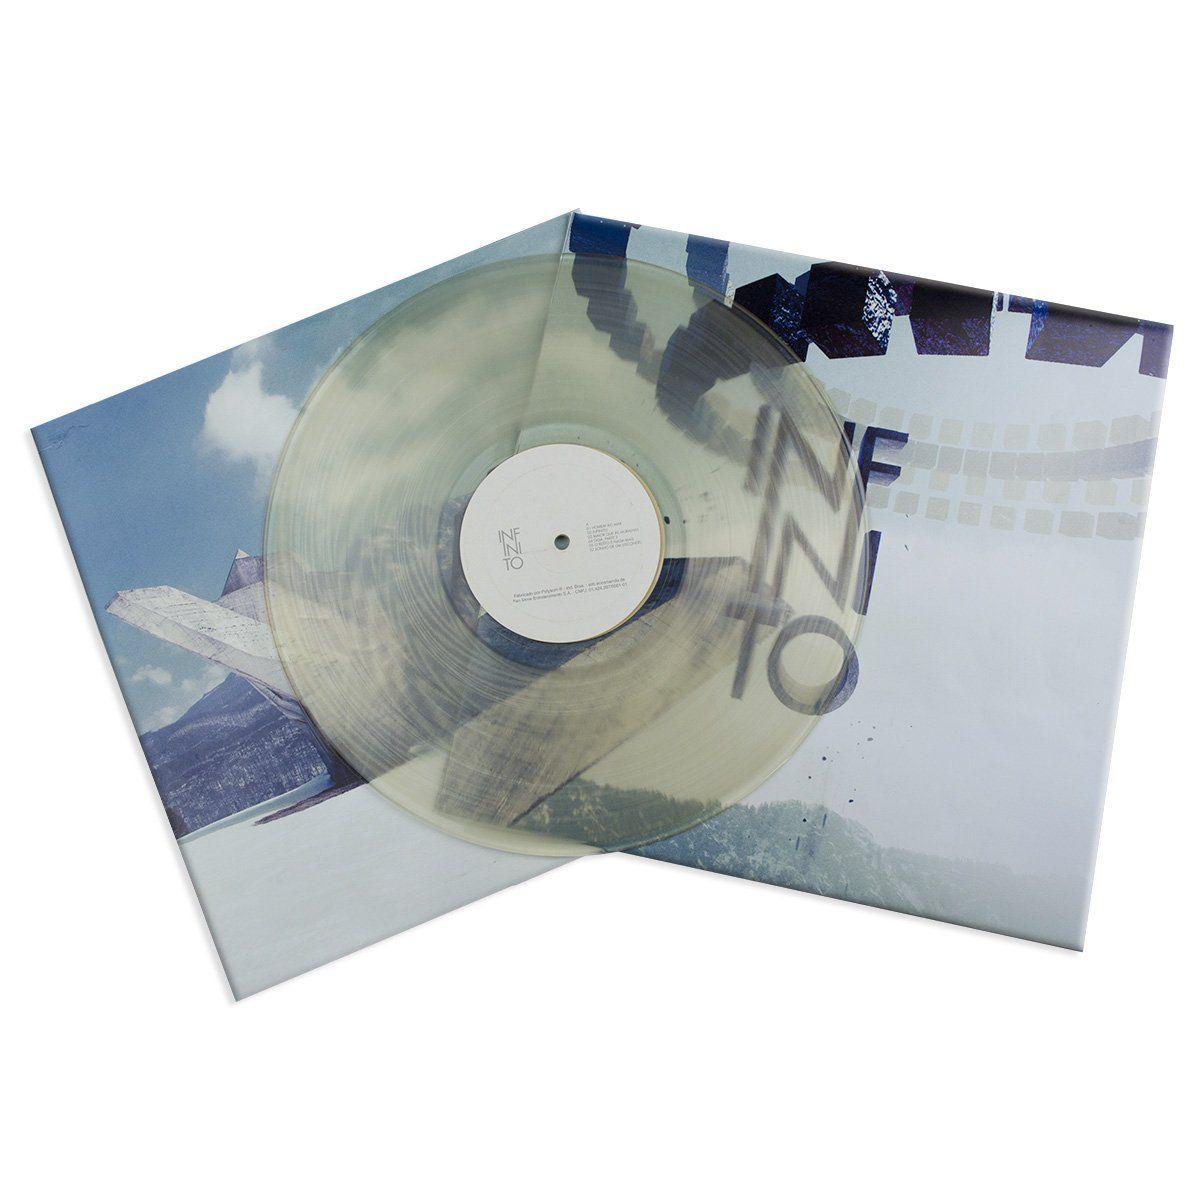 LP Fresno Infinito  - bandUP Store Marketplace